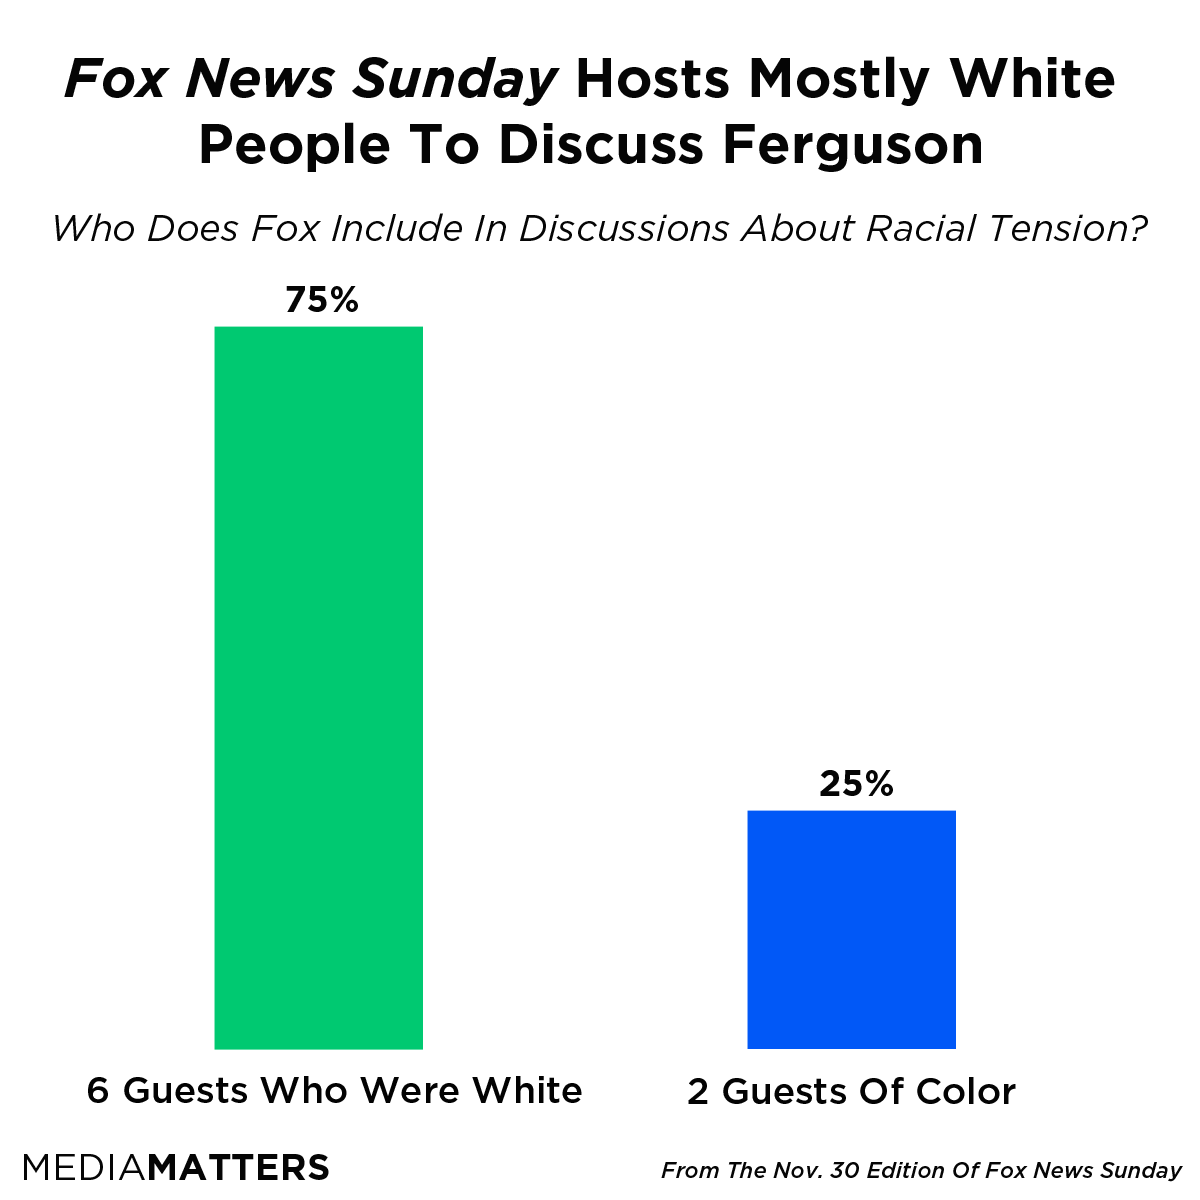 Fox News Sunday Guest November 30